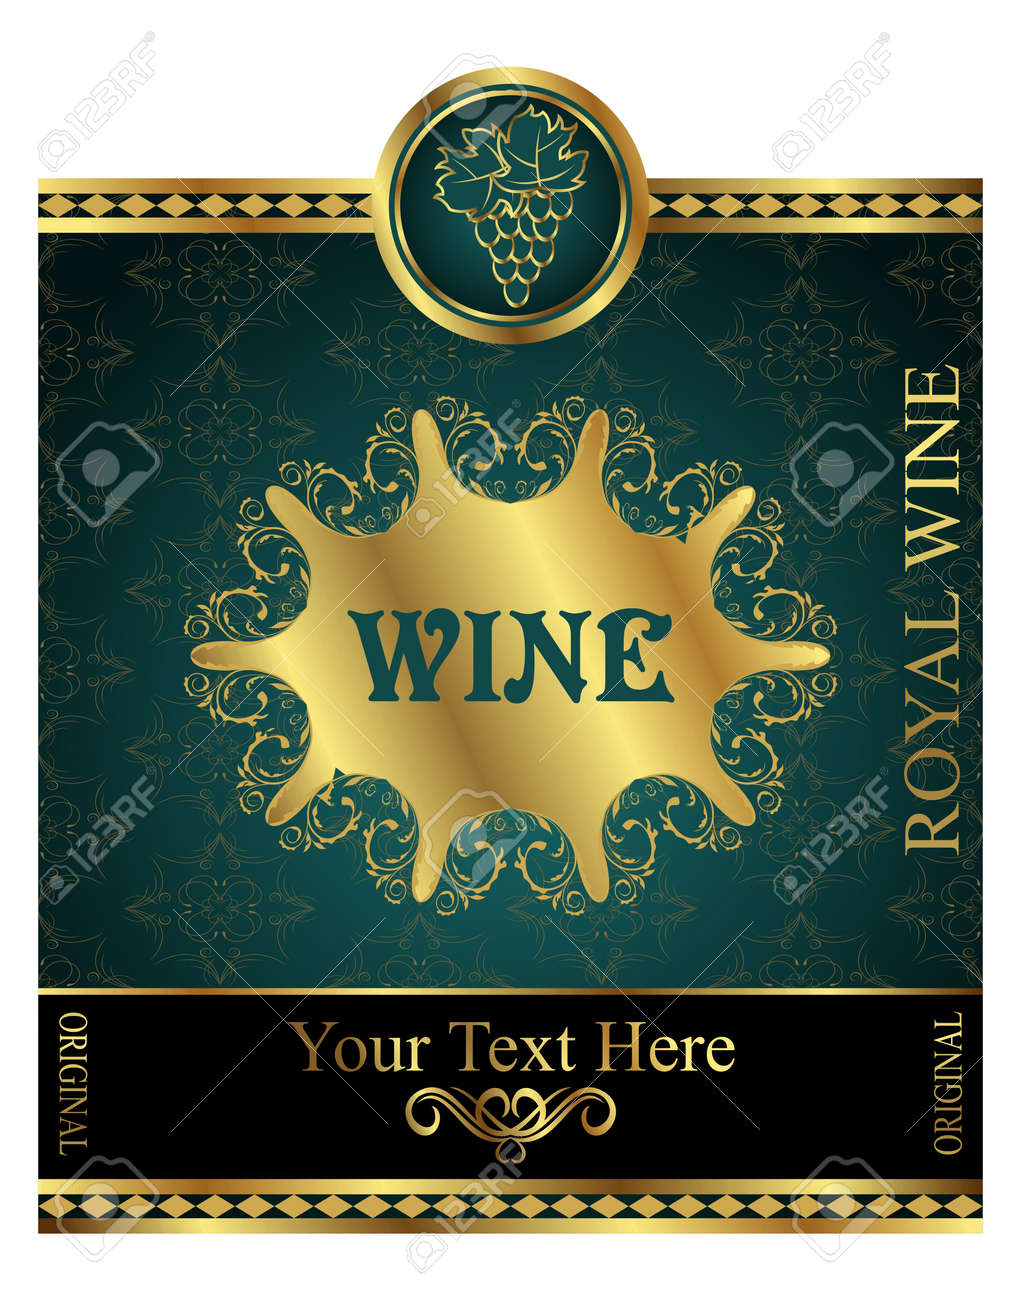 Illustration golden label for packing wine - vector Stock Illustration - 9247456